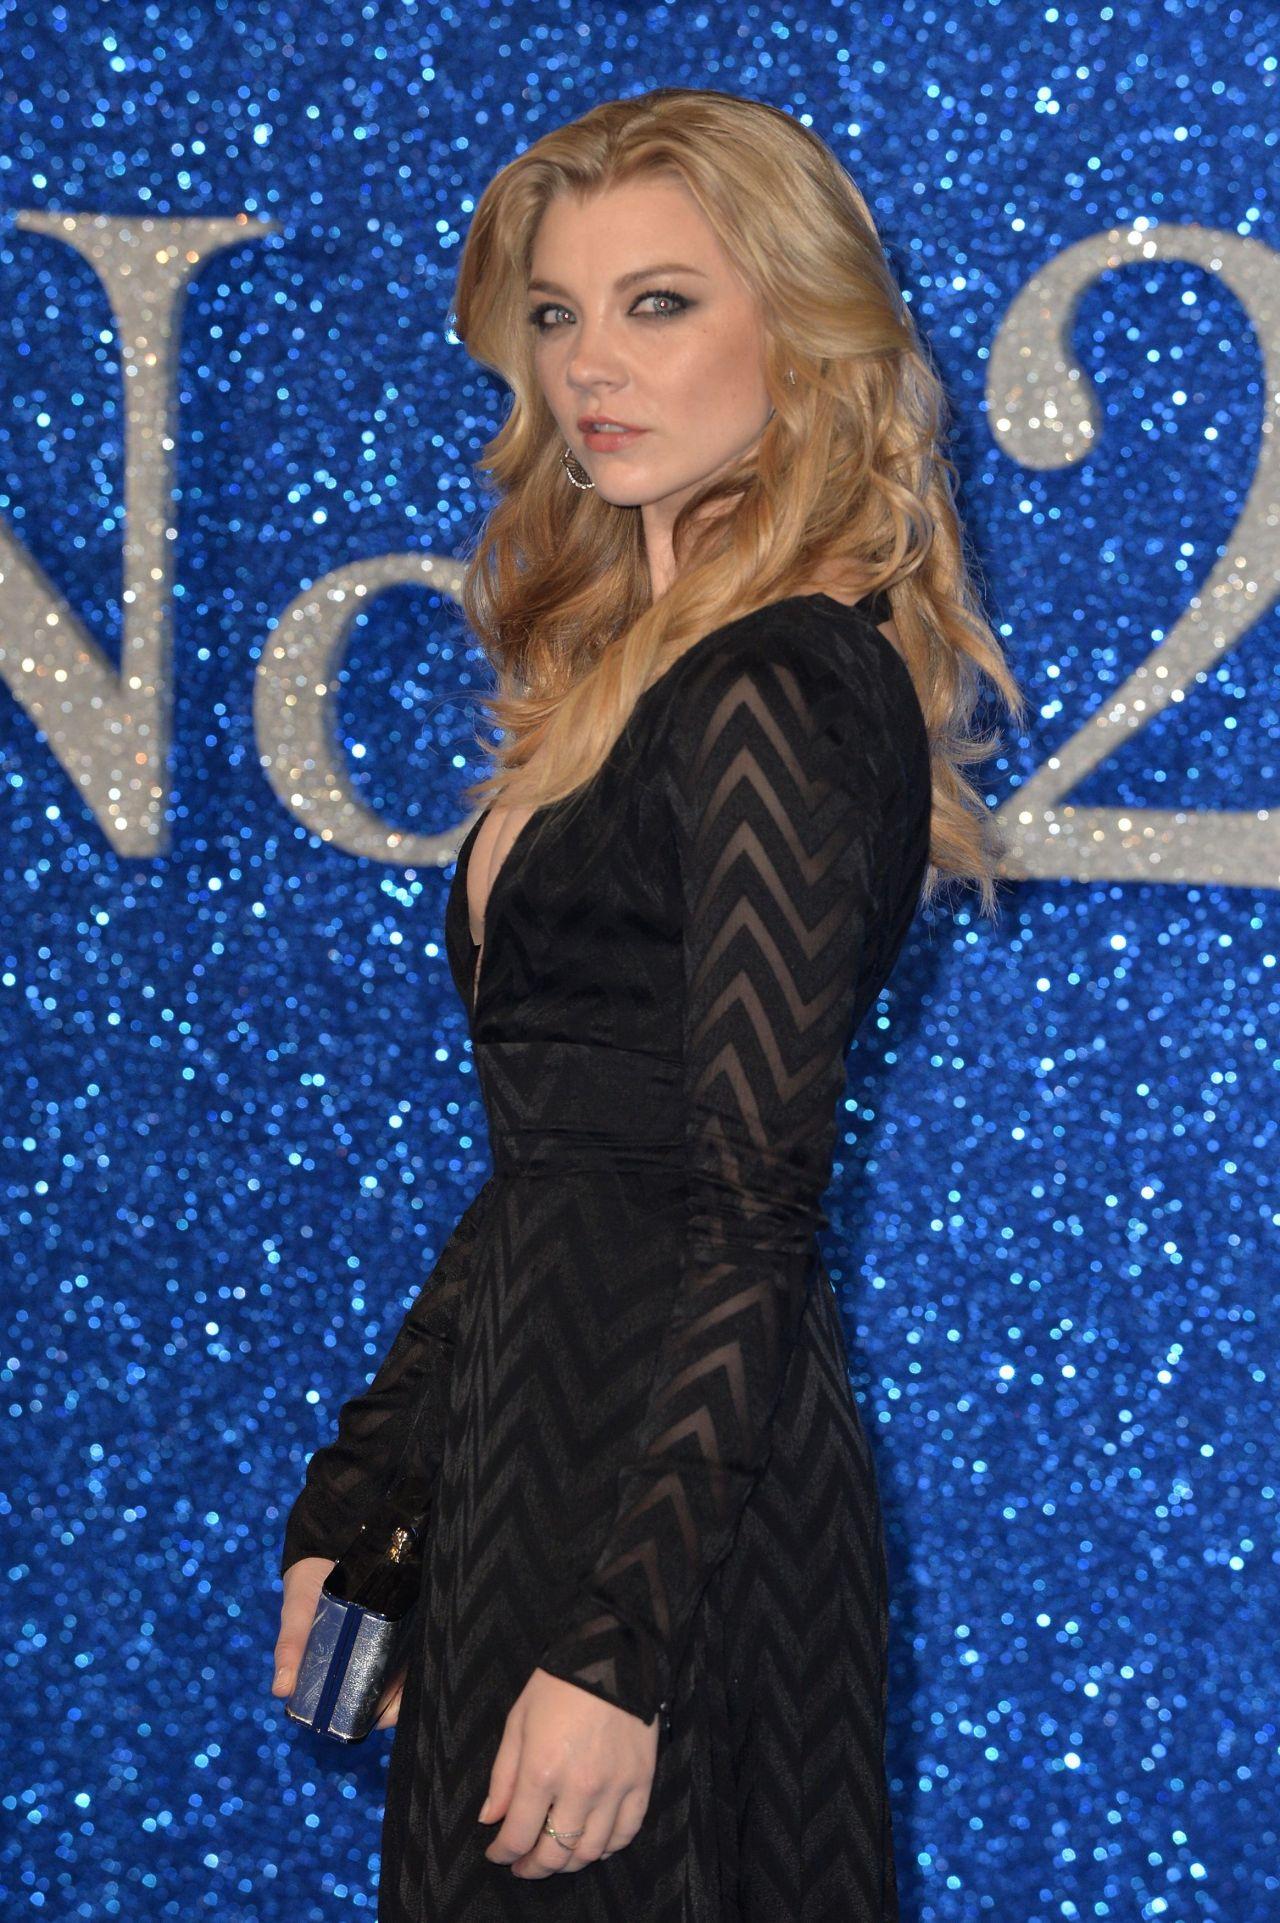 Natalie Dormer Zoolander No2 Premiere In London